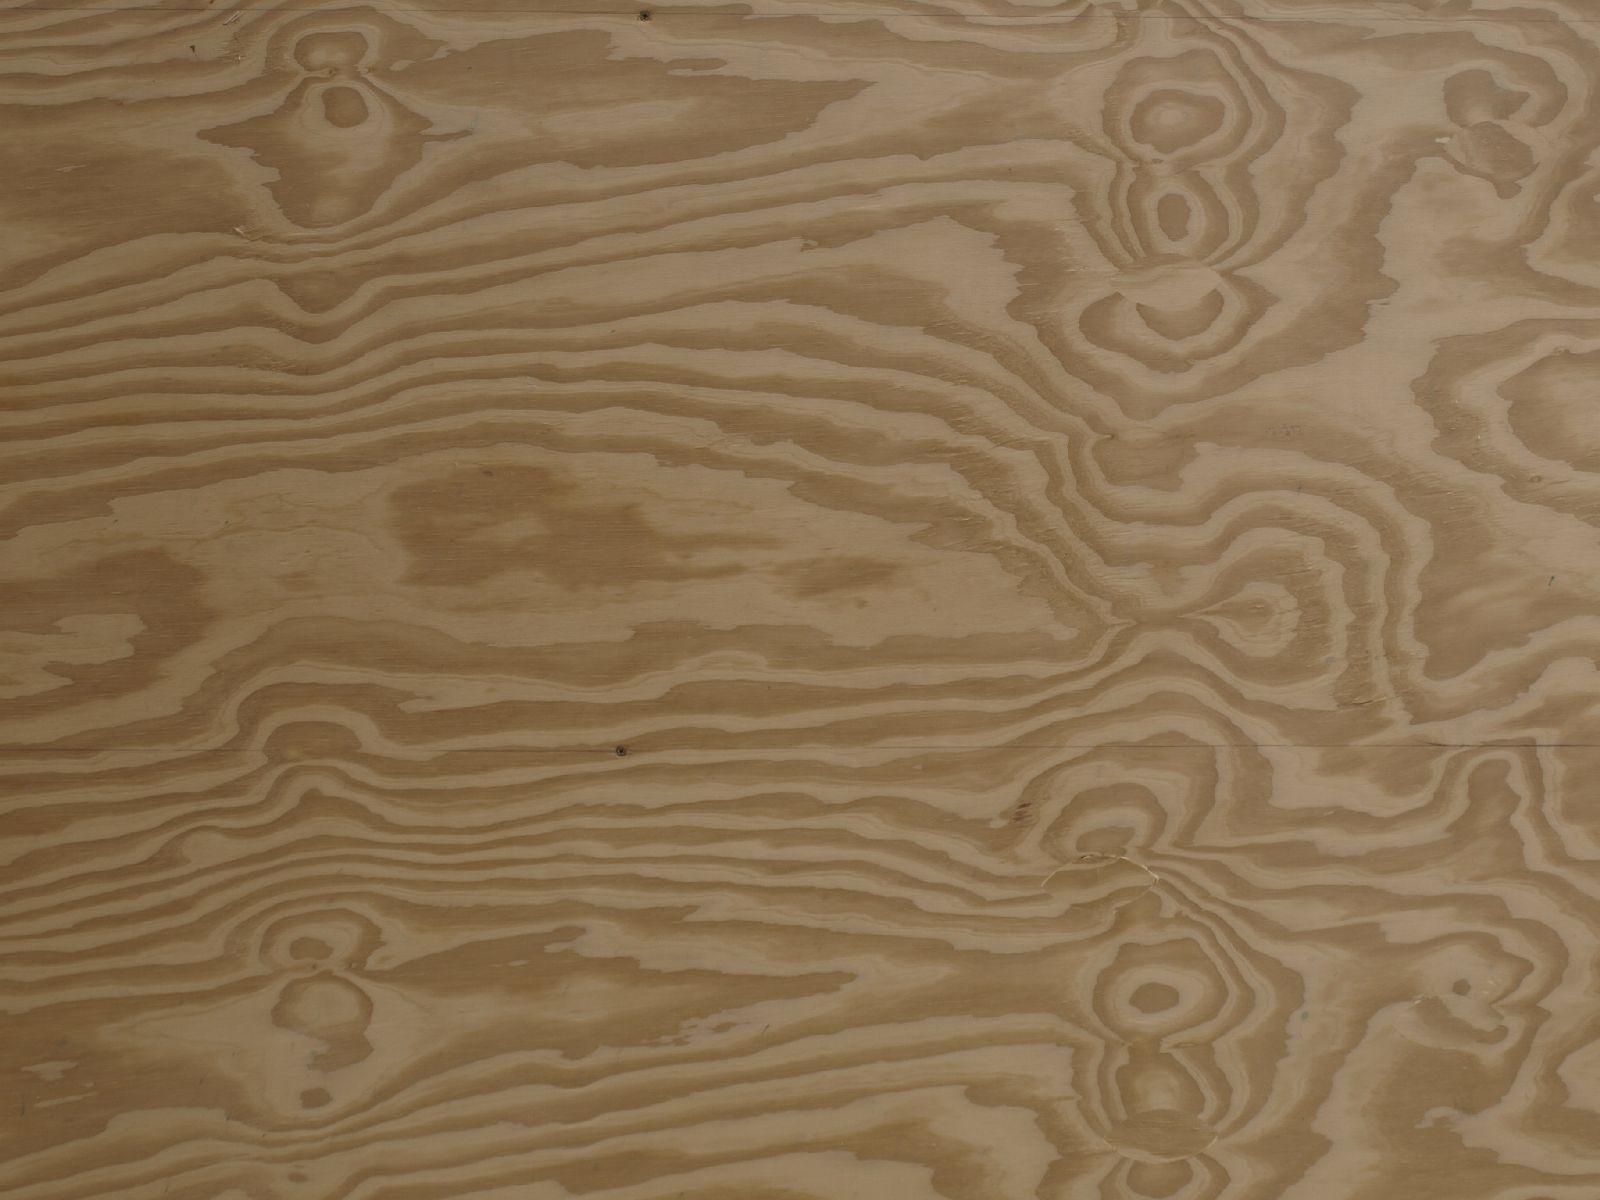 Wood_Texture_A_P4041483